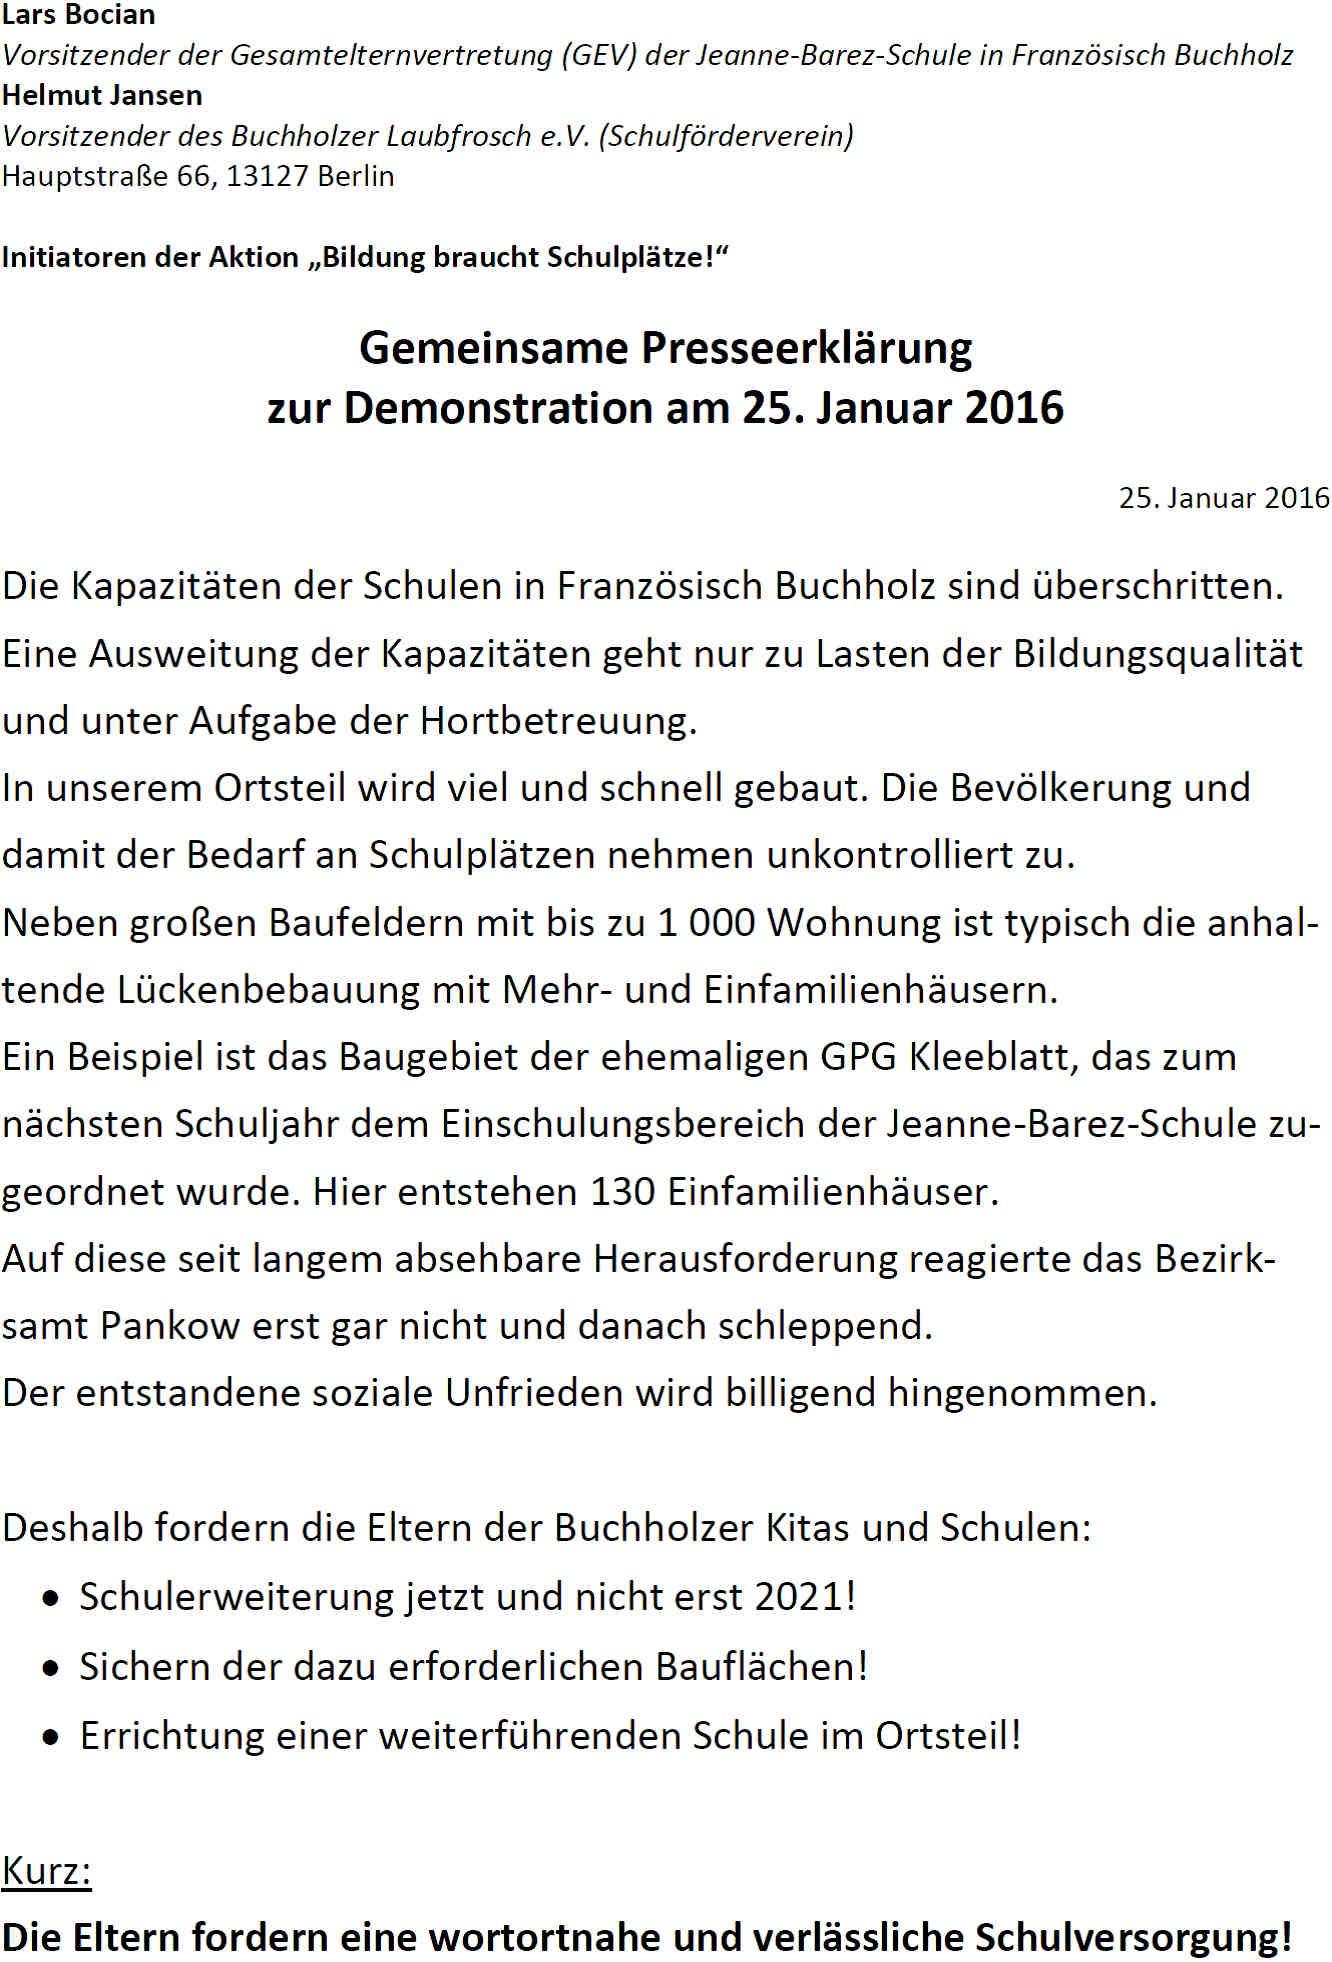 Bild_Presseerklaerung_25012016